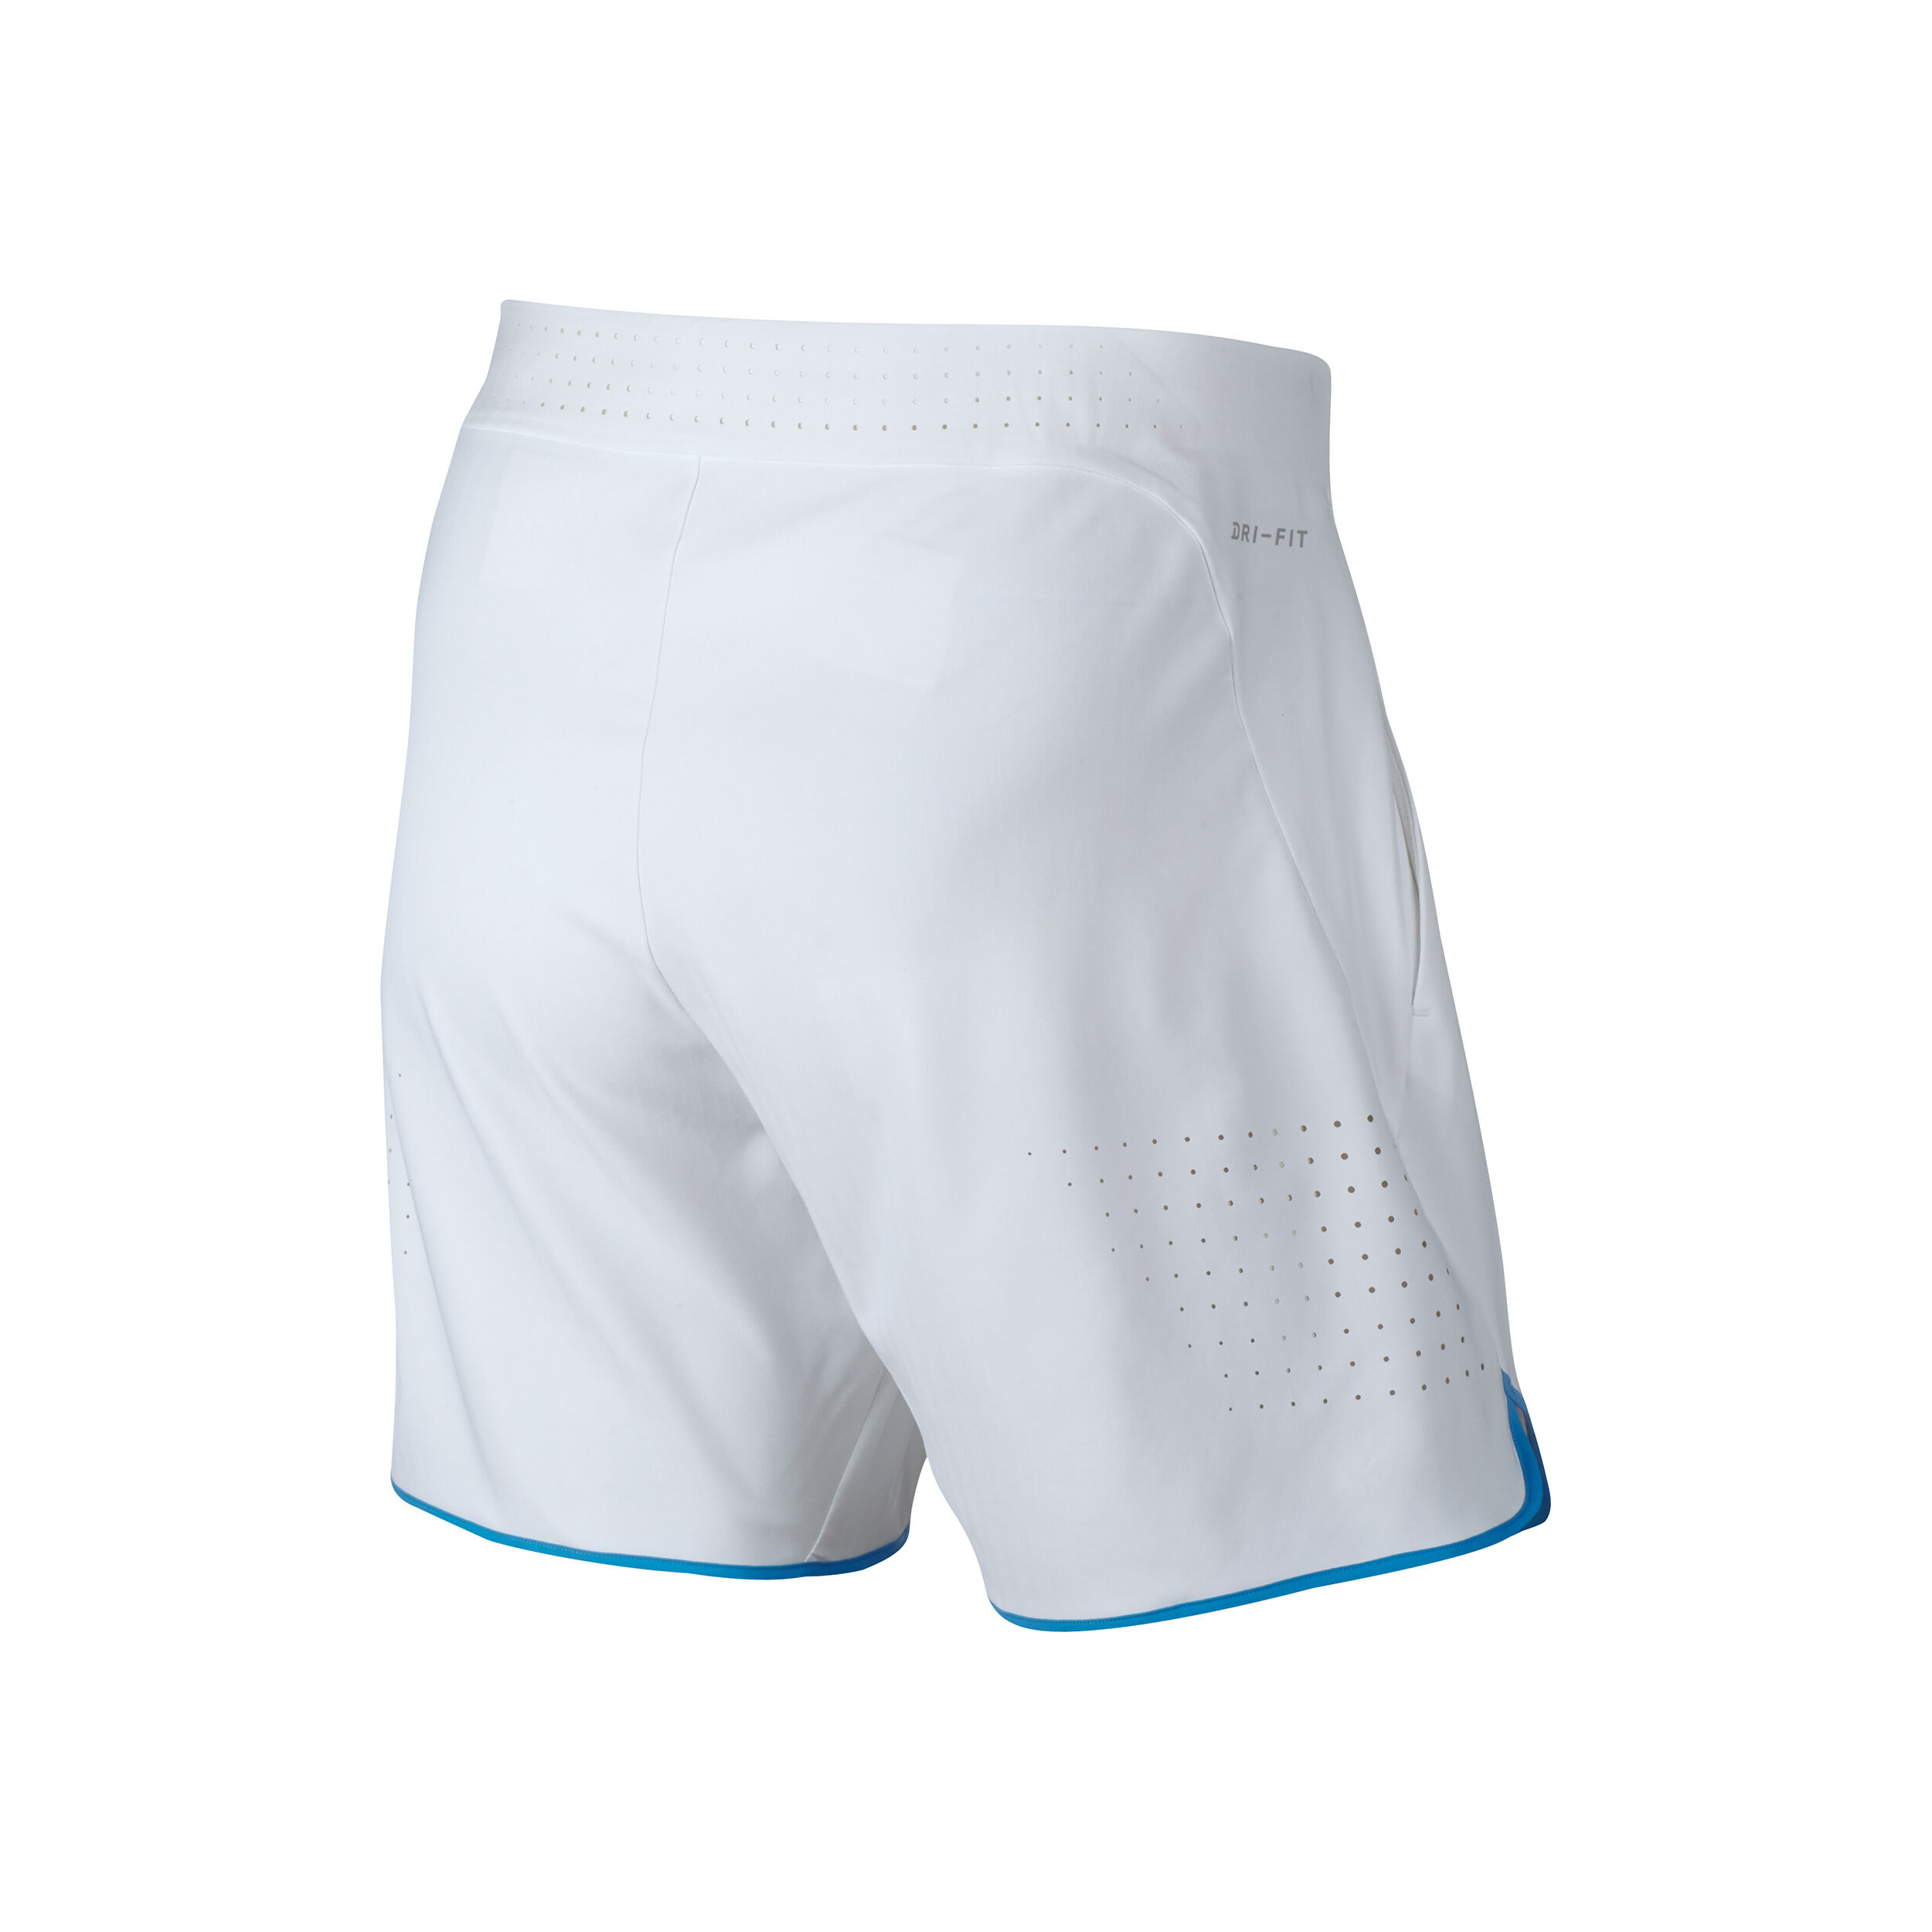 Nike Rafael Nadal Flex Gladiator 7